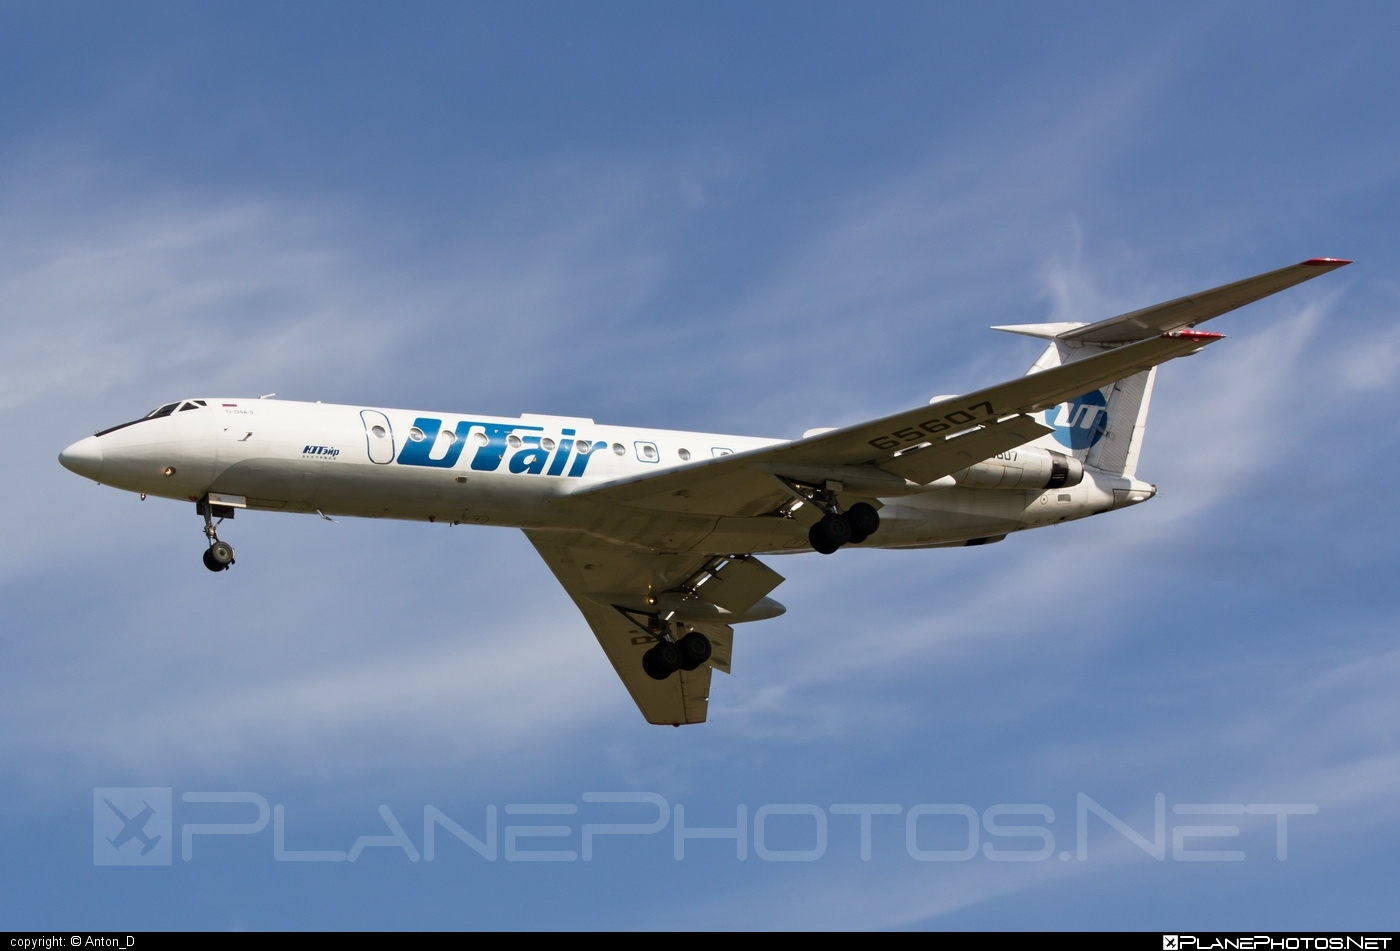 Tupolev Tu-134A-3 - RA-65607 operated by UTair Aviation #tu134 #tu134a3 #tupolev #tupolev134 #tupolevtu134 #tupolevtu134a3 #utair #utairaviation